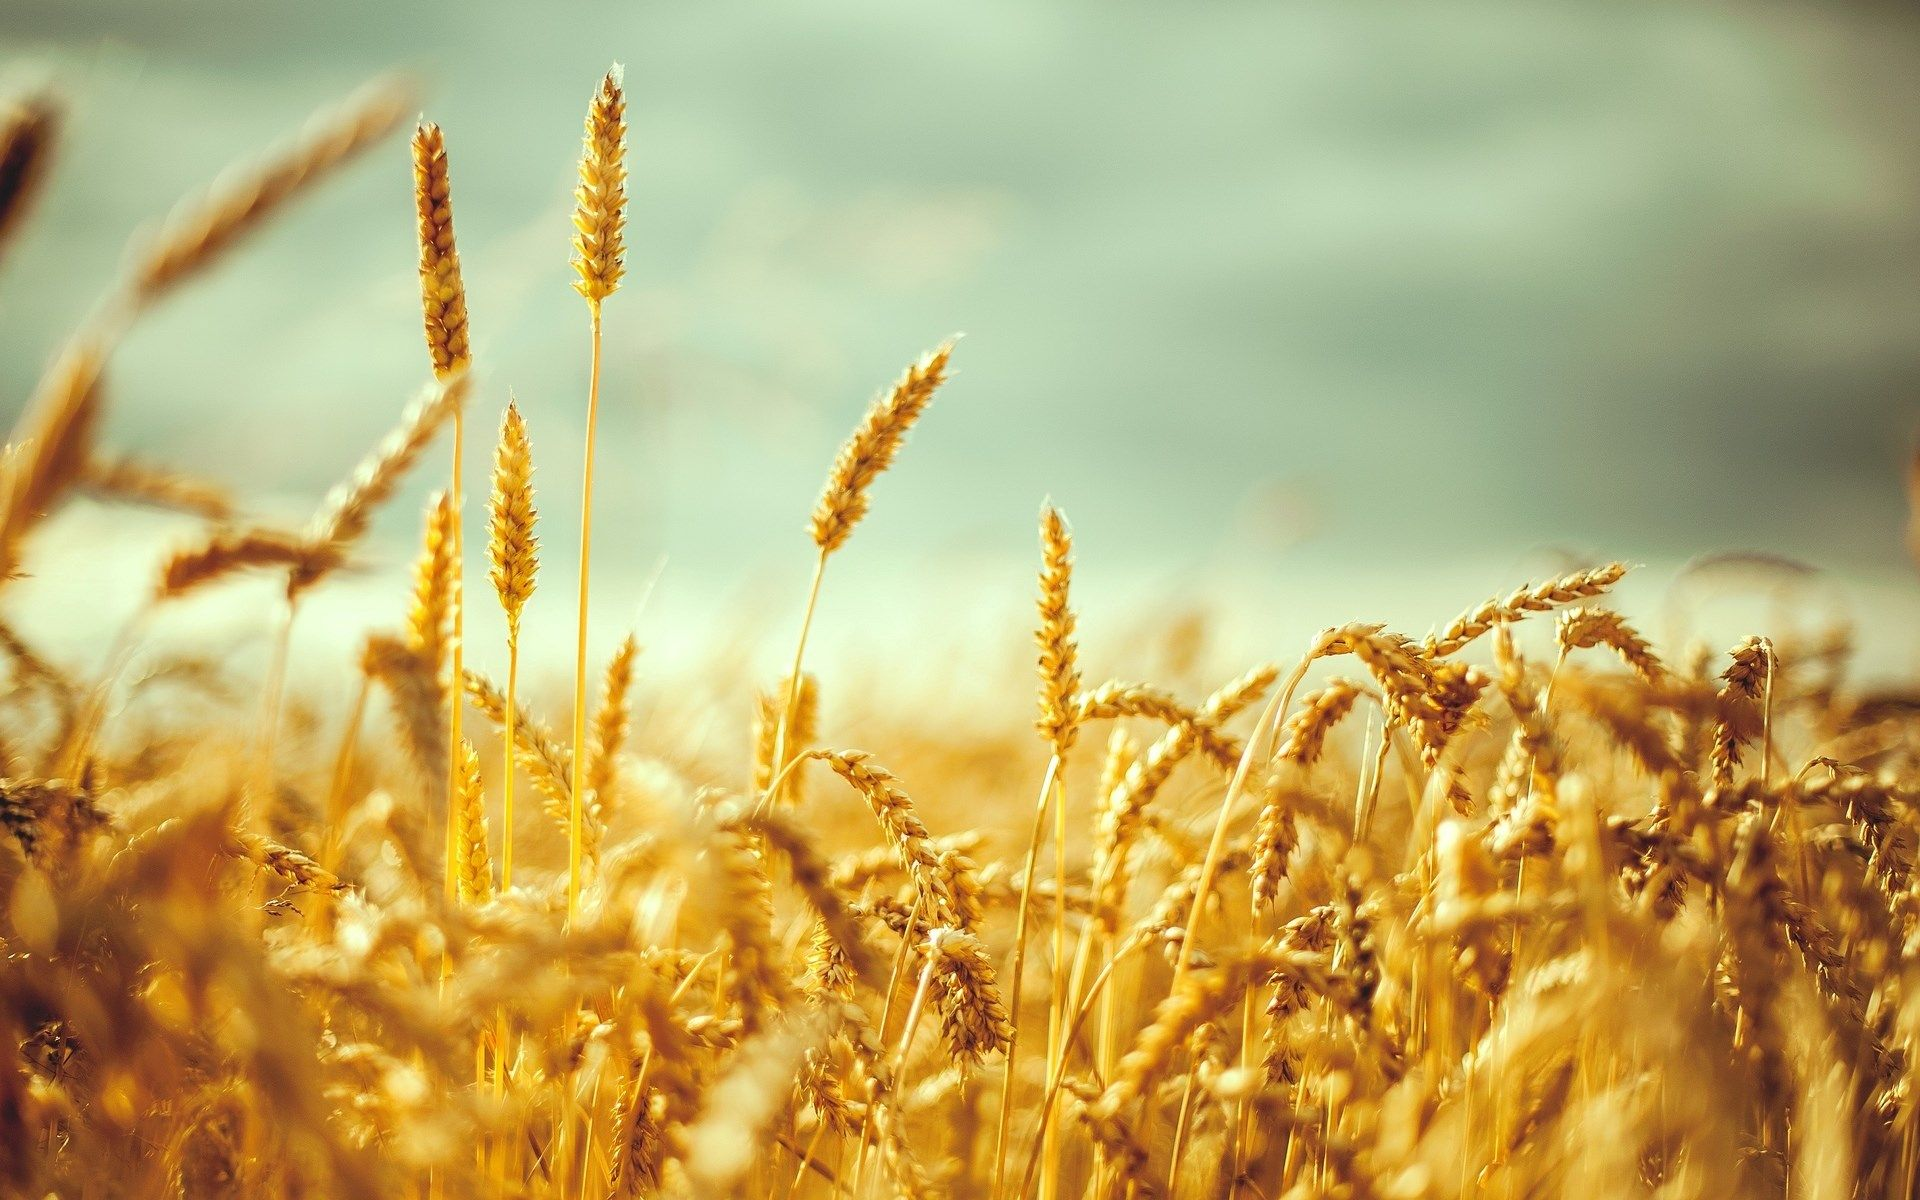 Wheat Wave Analysis – 13 January, 2020